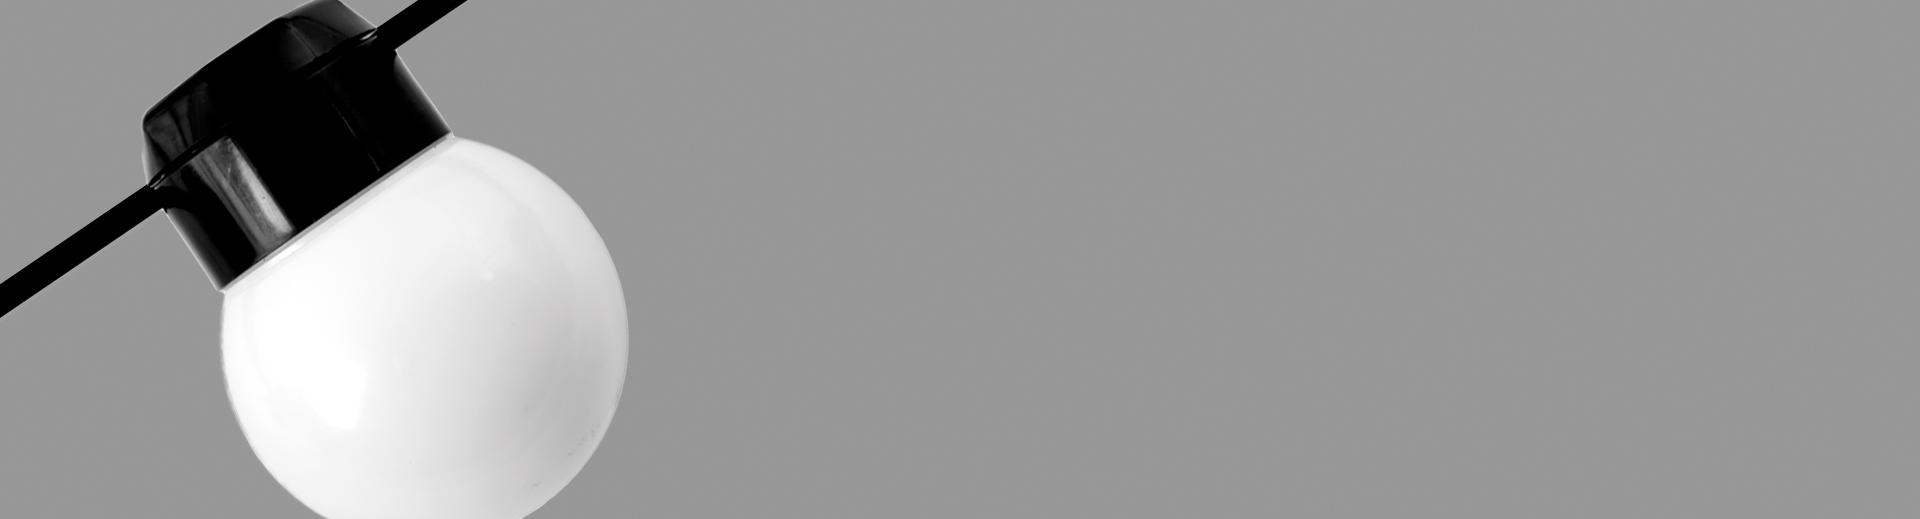 DuraLamp_Intellistrand_Banner